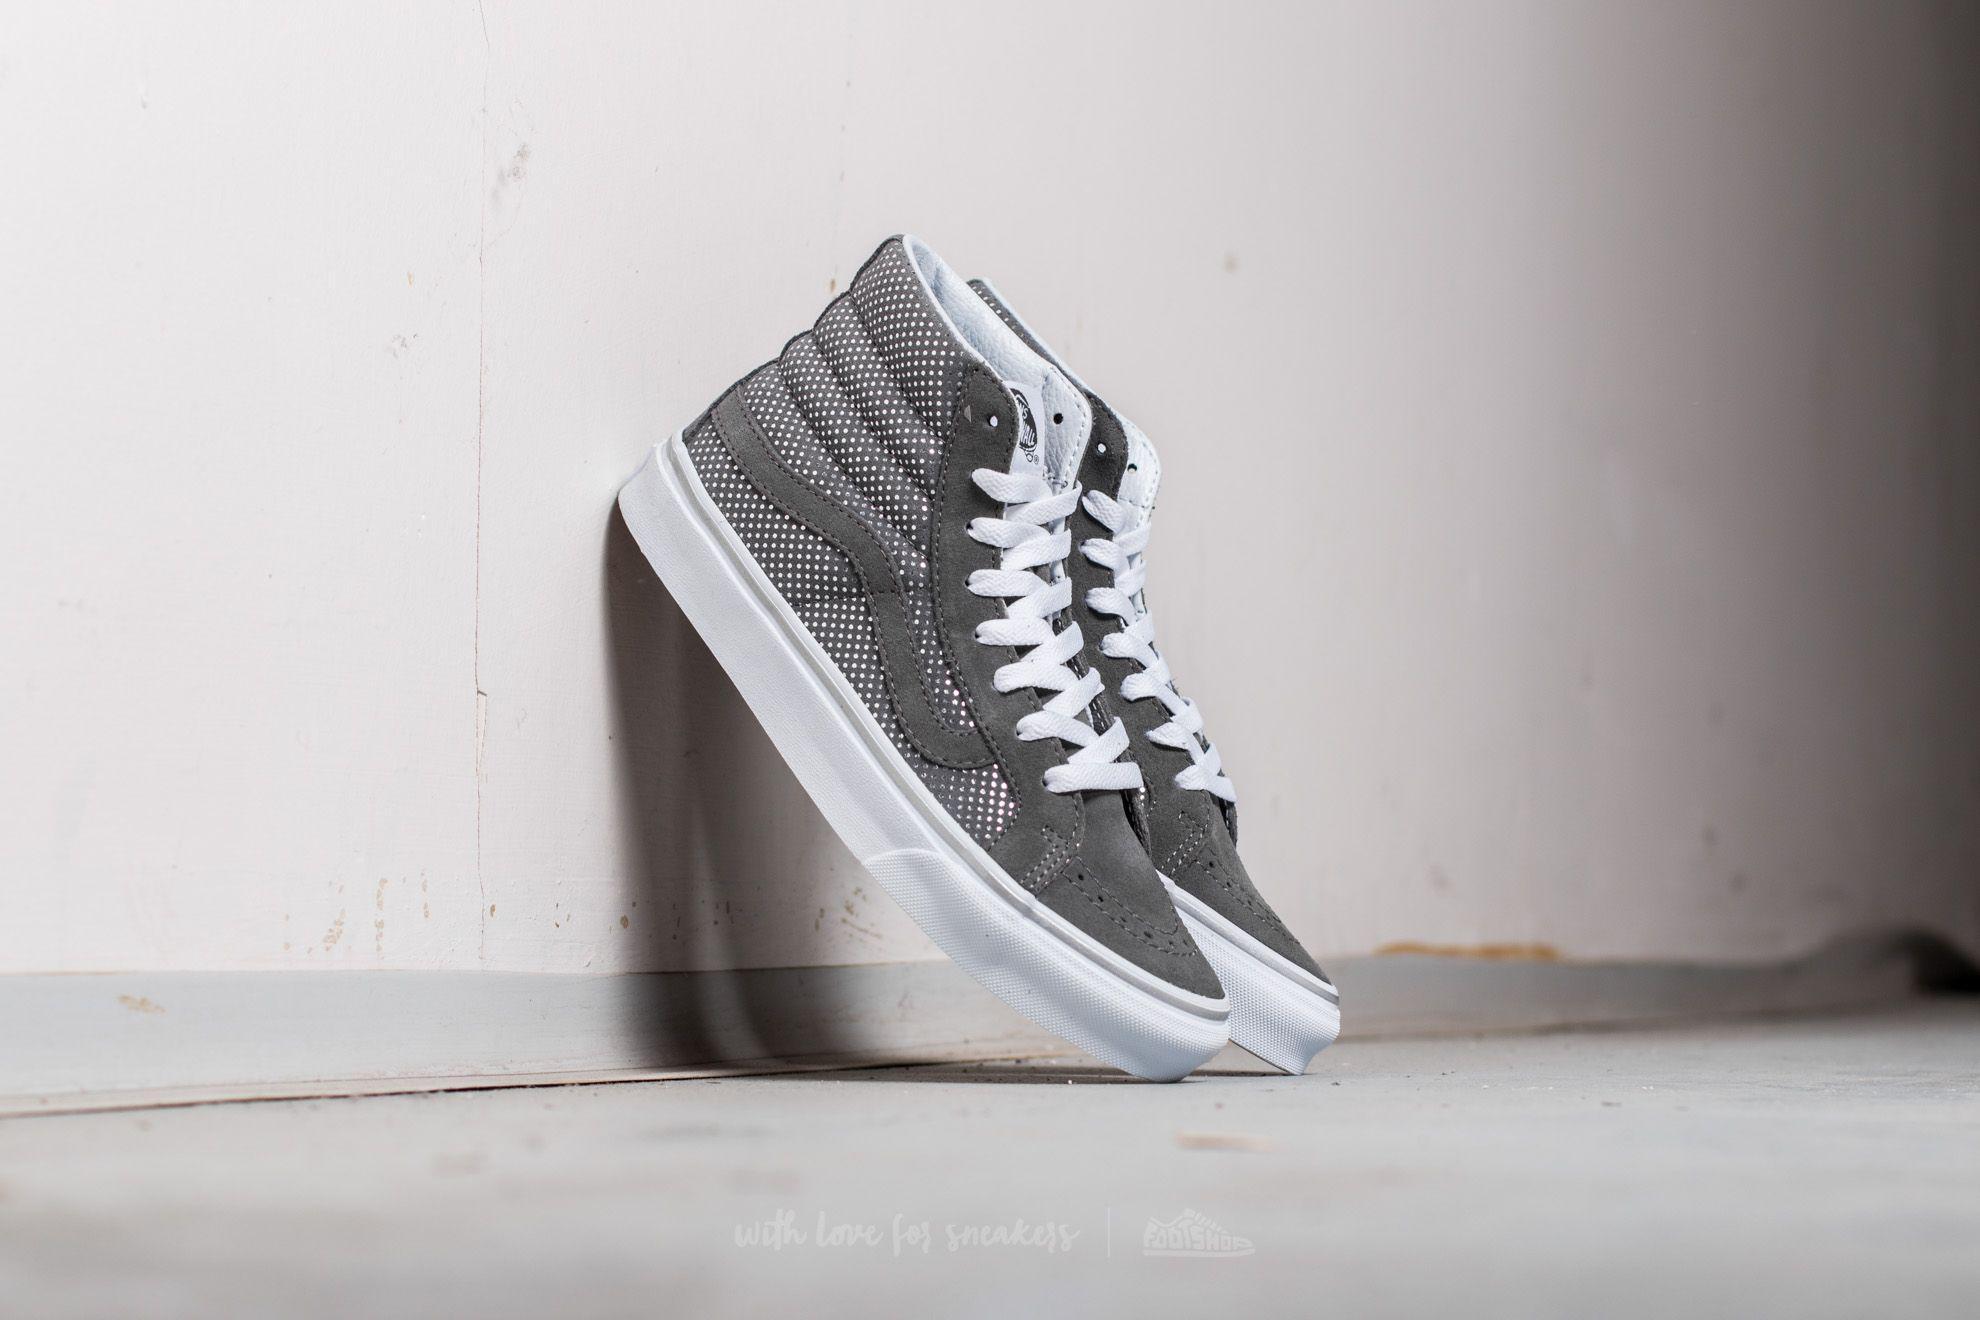 d2a56ab98c Lyst - Vans Sk8-hi Slim (metallic Dots) Dark Grey in Gray